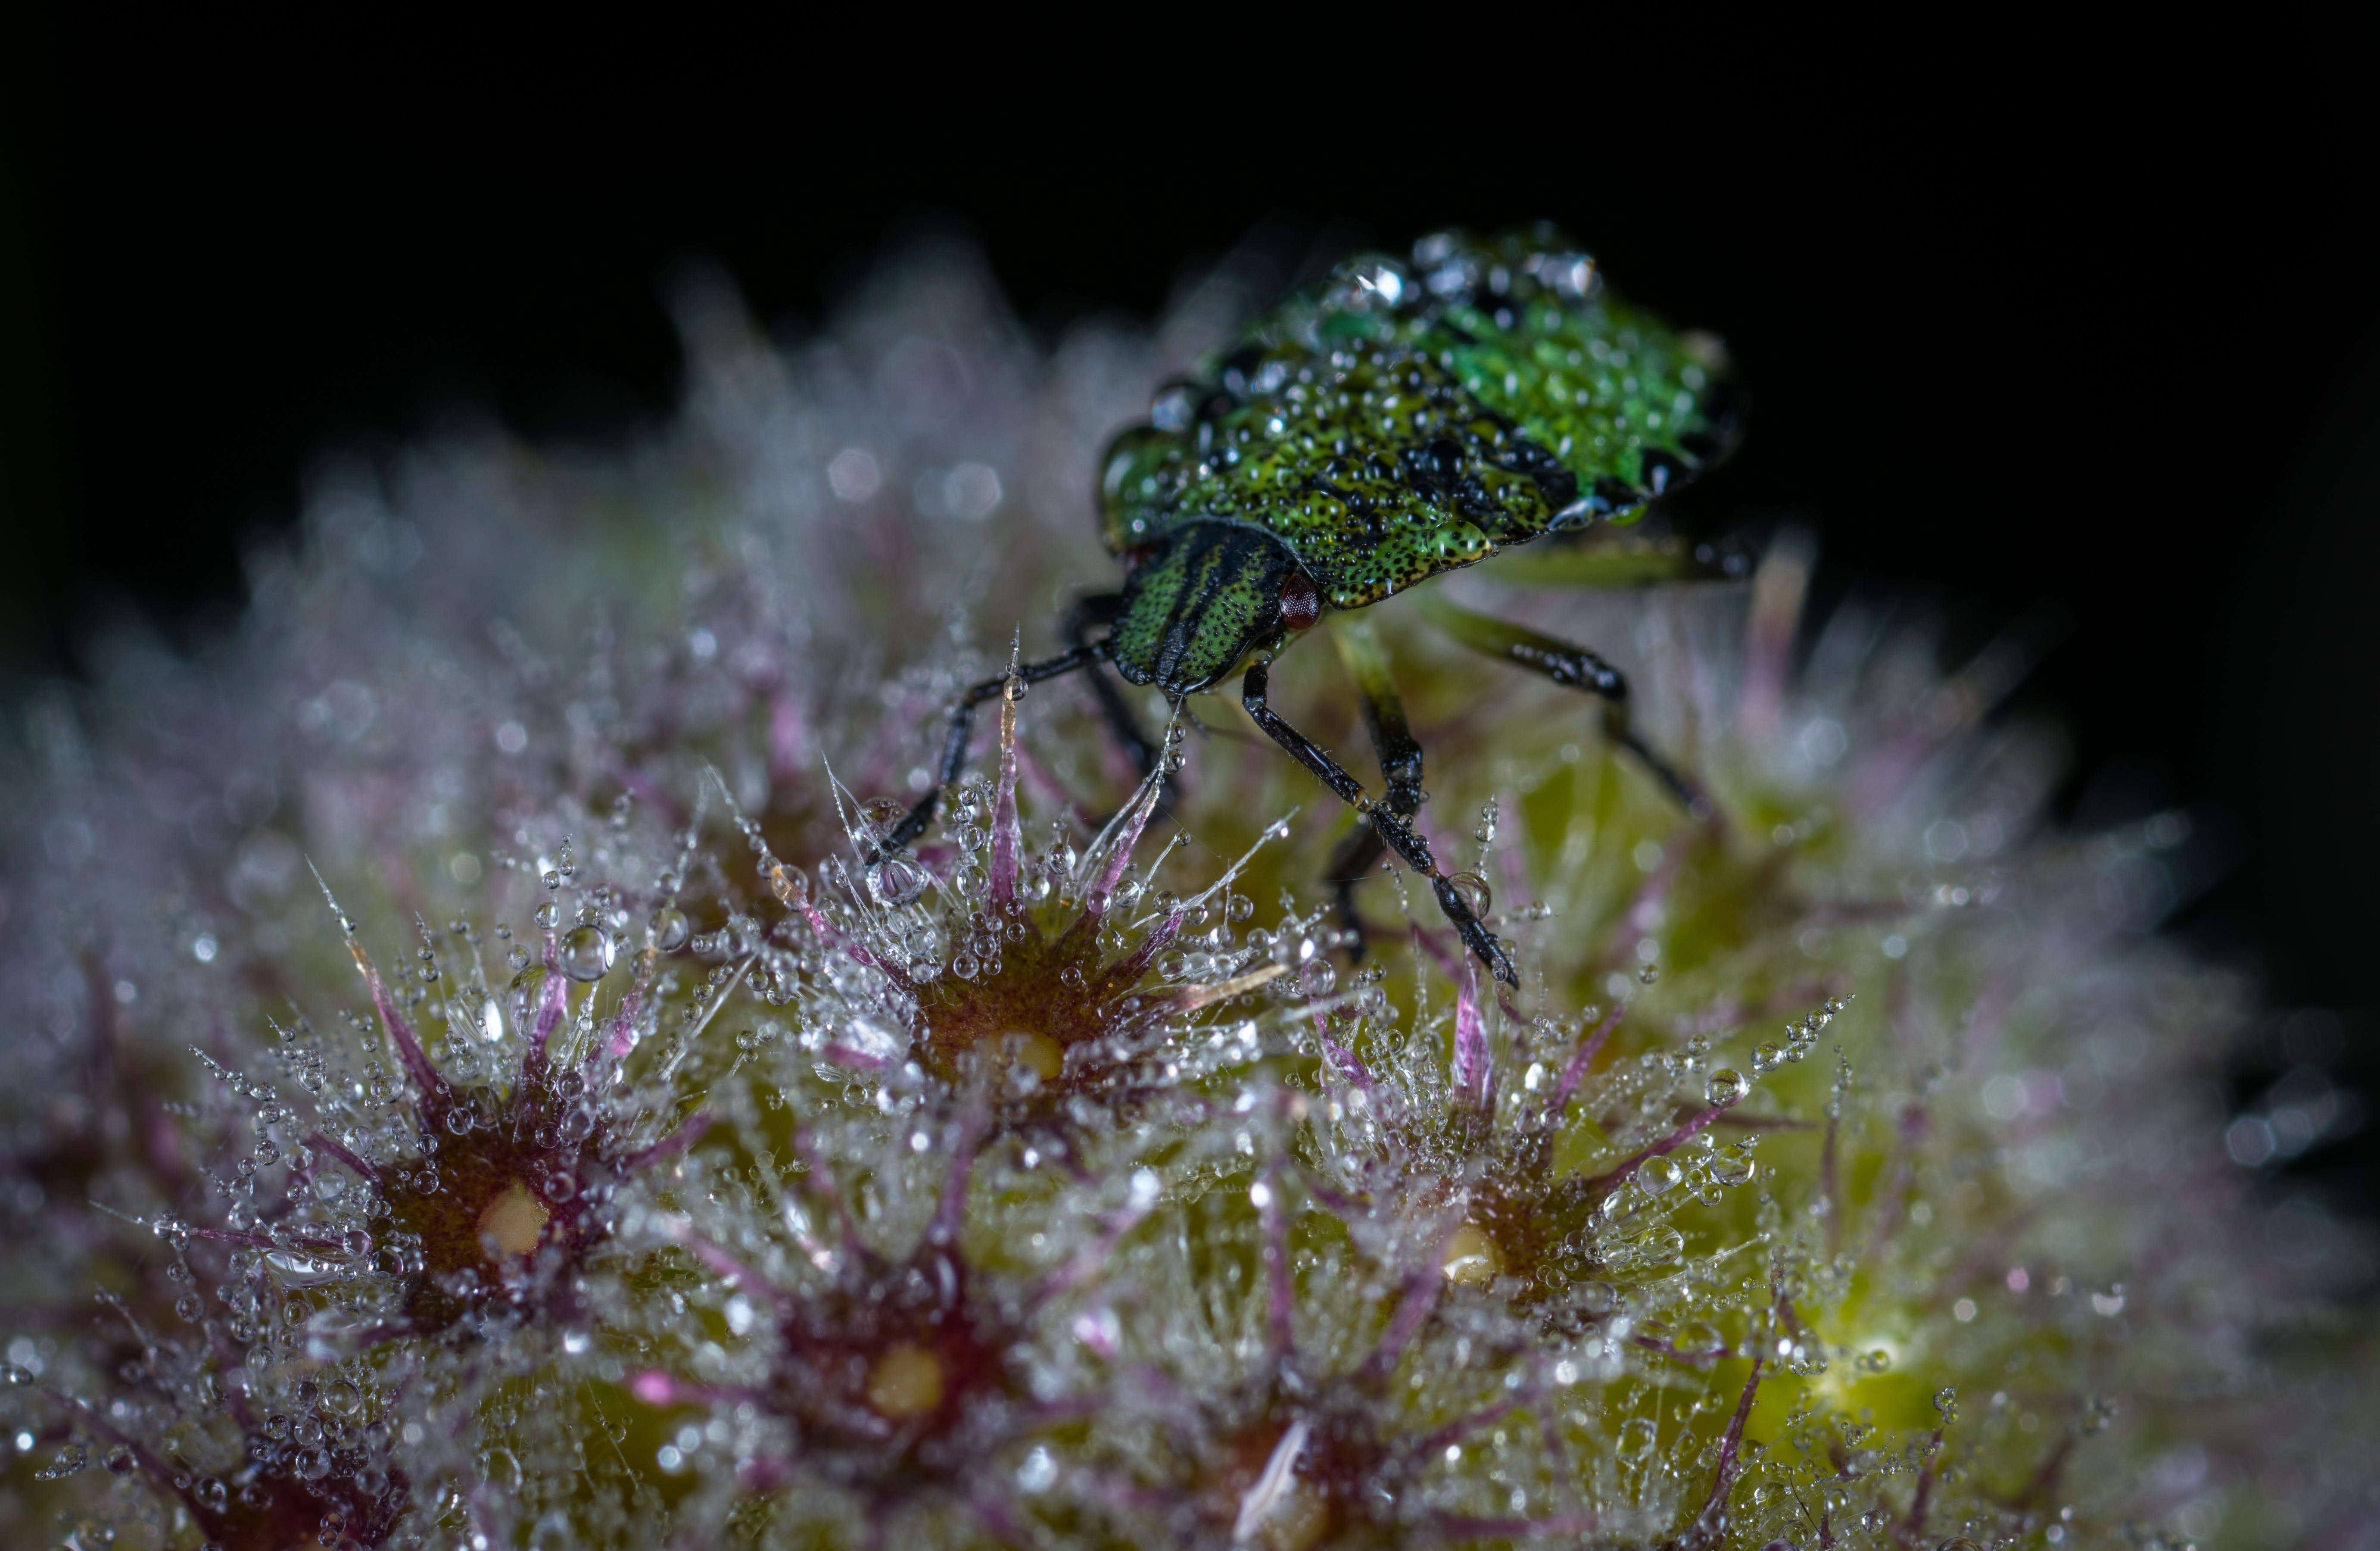 Green Bug on Flower Macro Photography